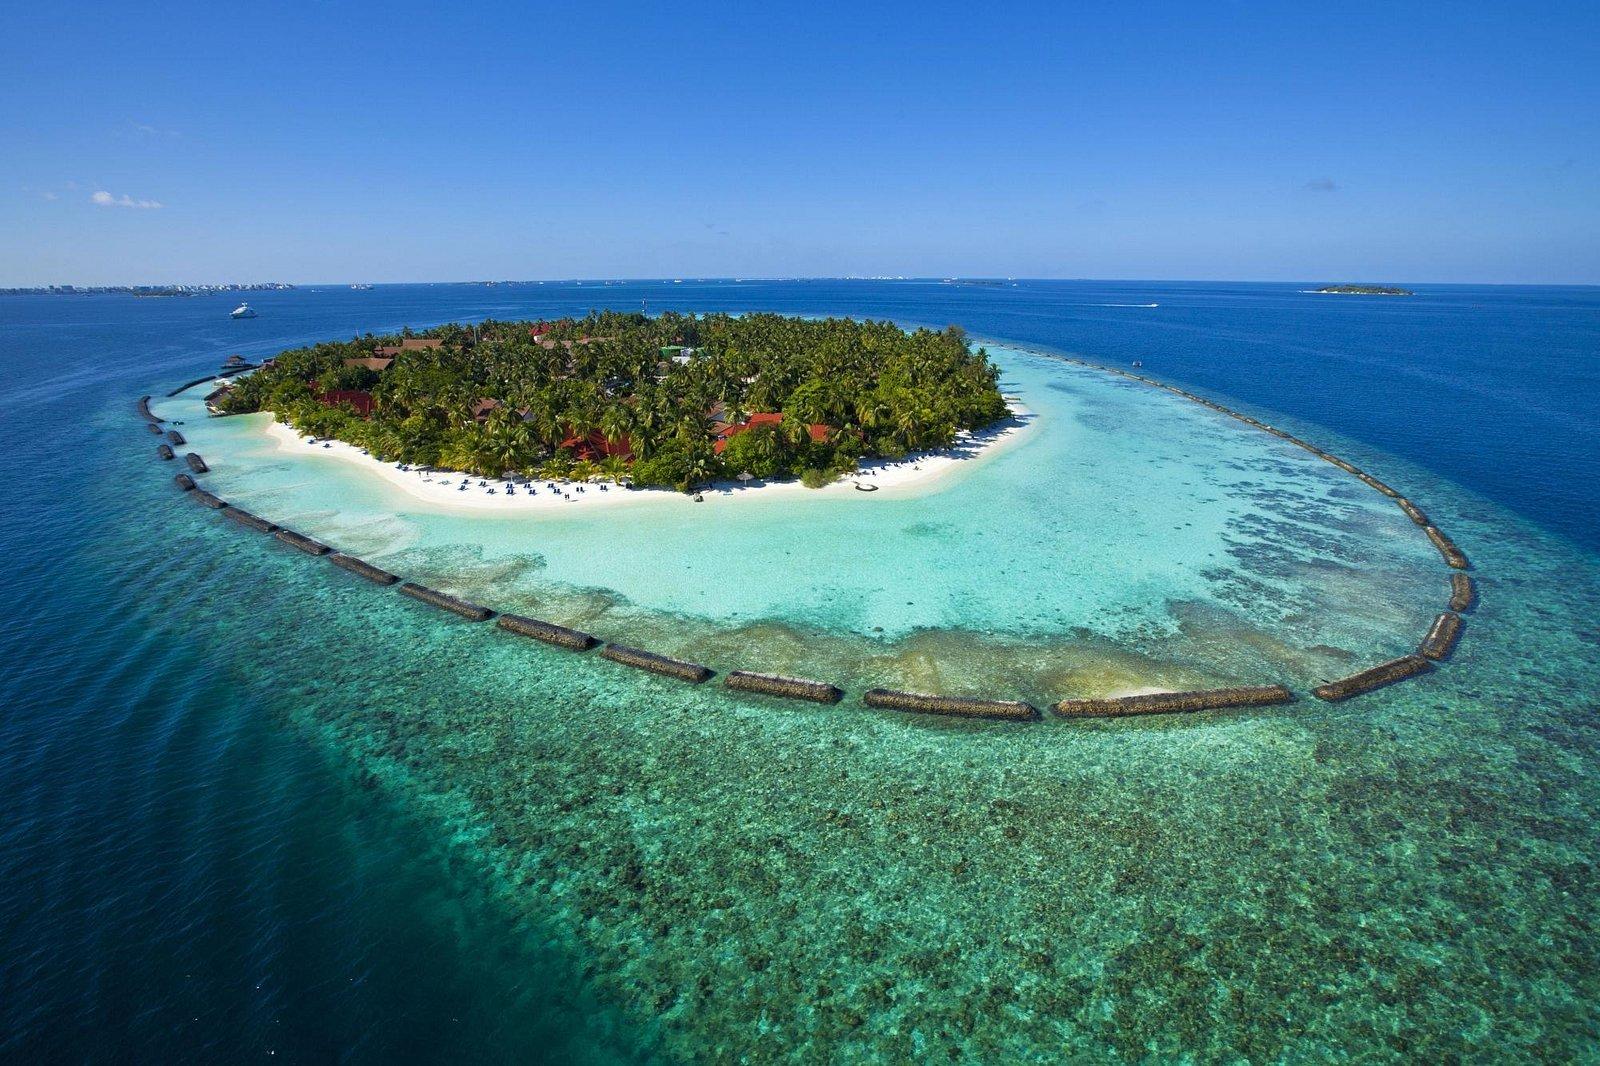 VIhamanafushi Kurumba Maldives Male' views